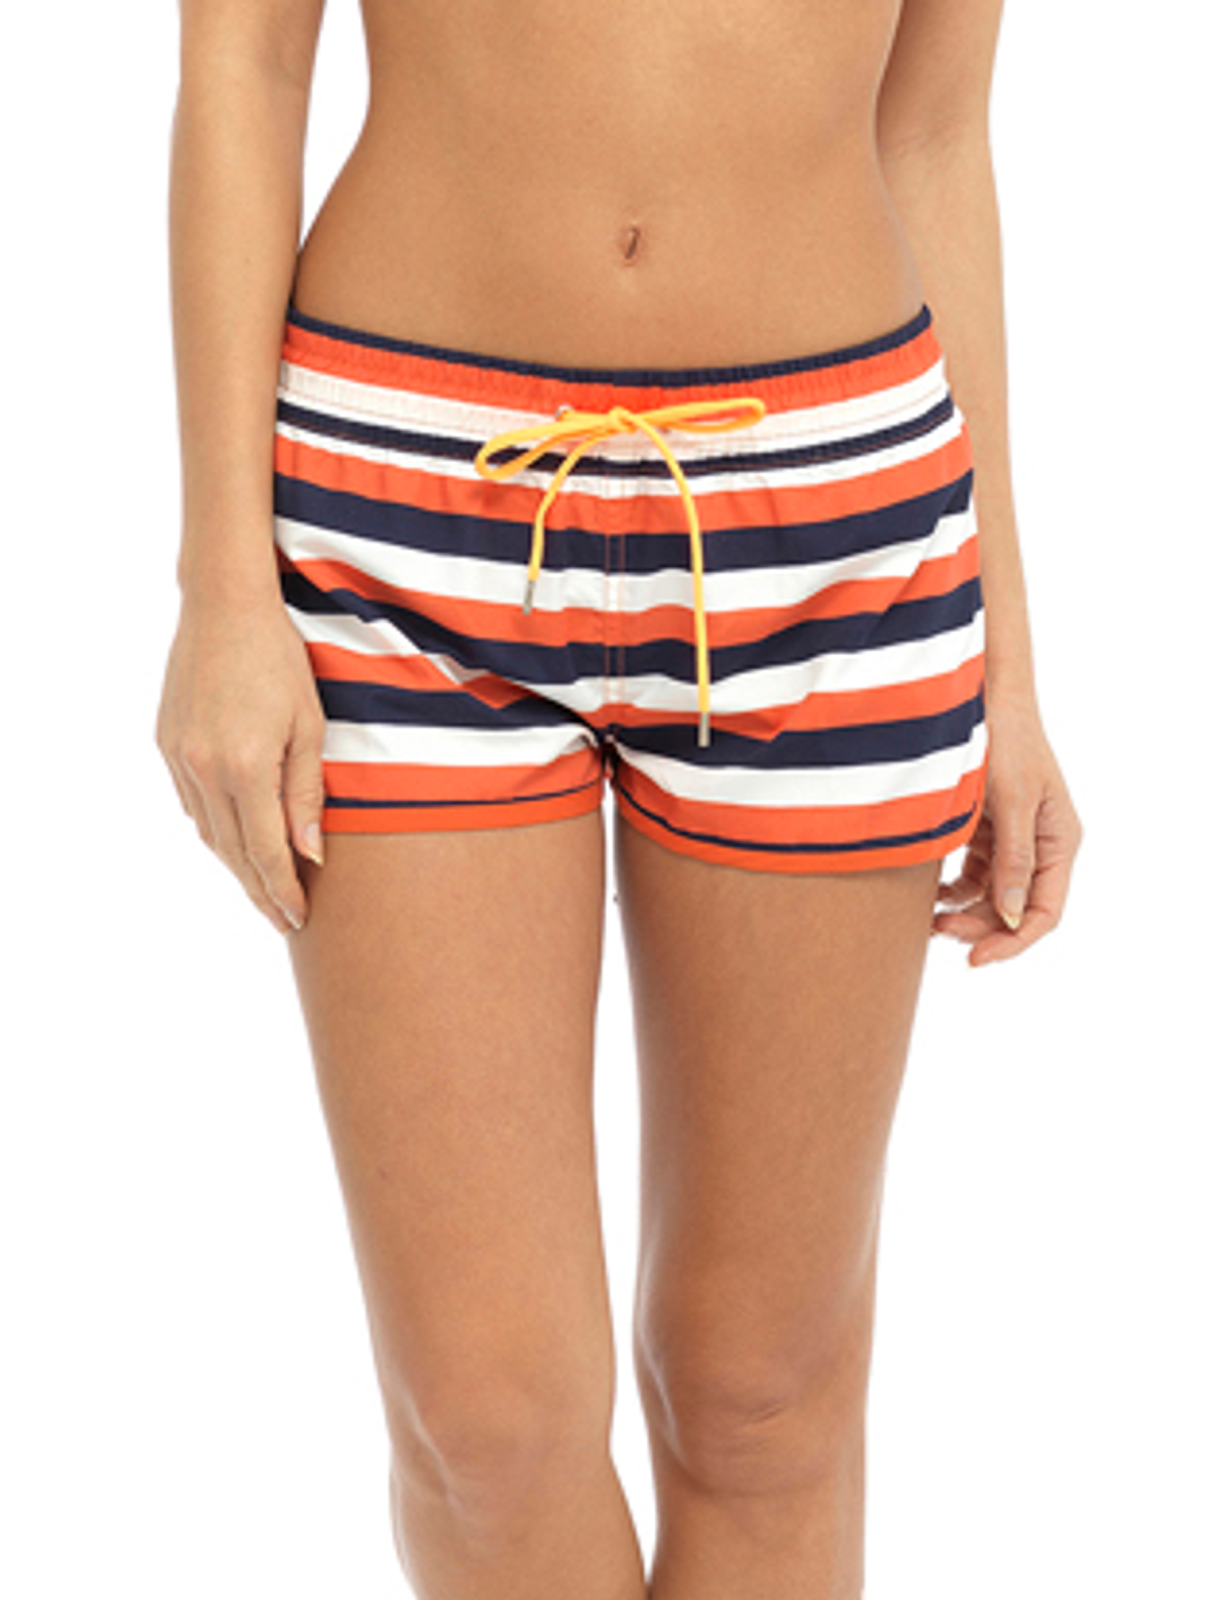 5ed995683d Womens High Waisted Beach Shorts Elasticated Summer Swim Shorts ...